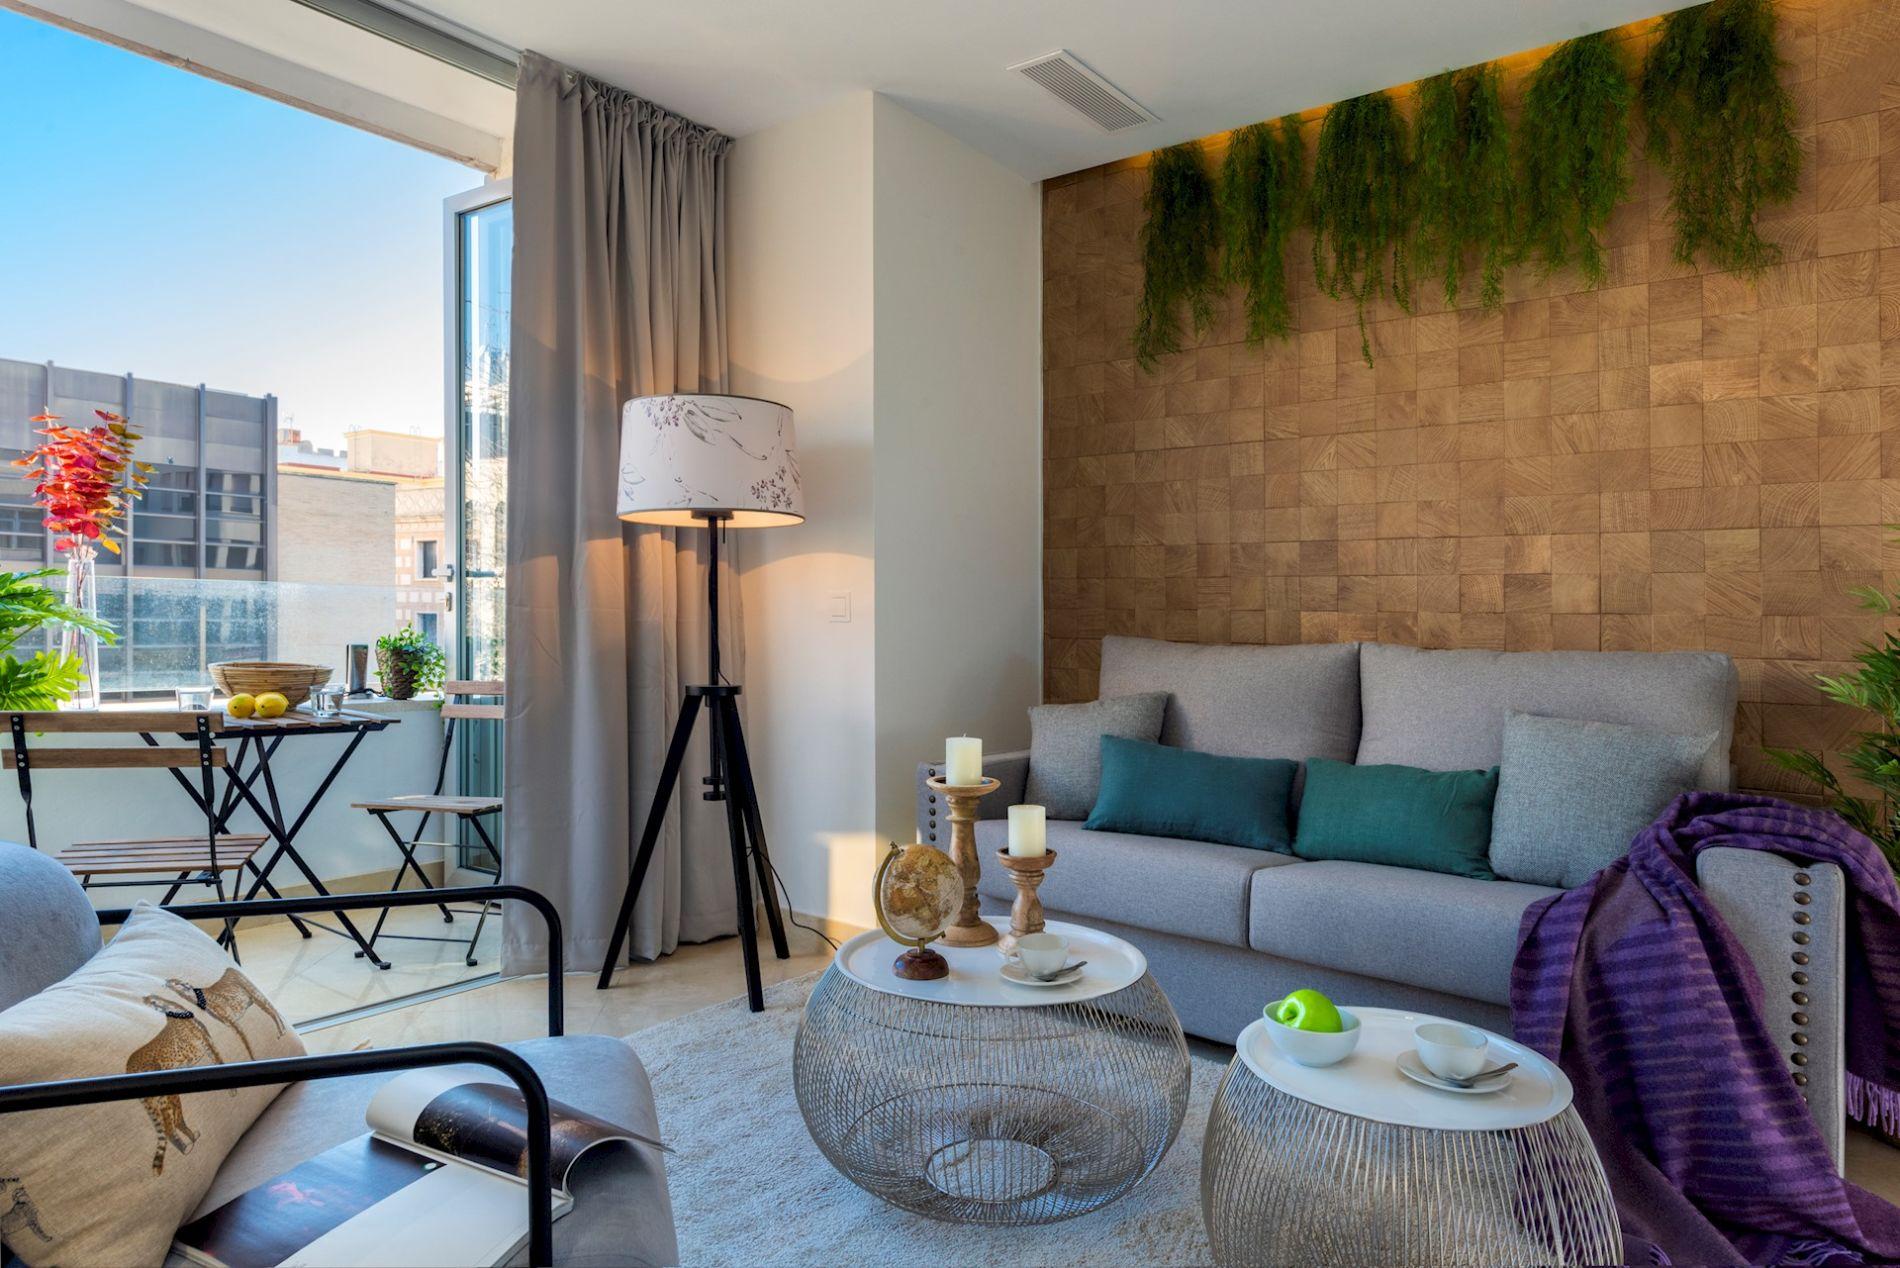 Apartment in Sevilla with a private balcony